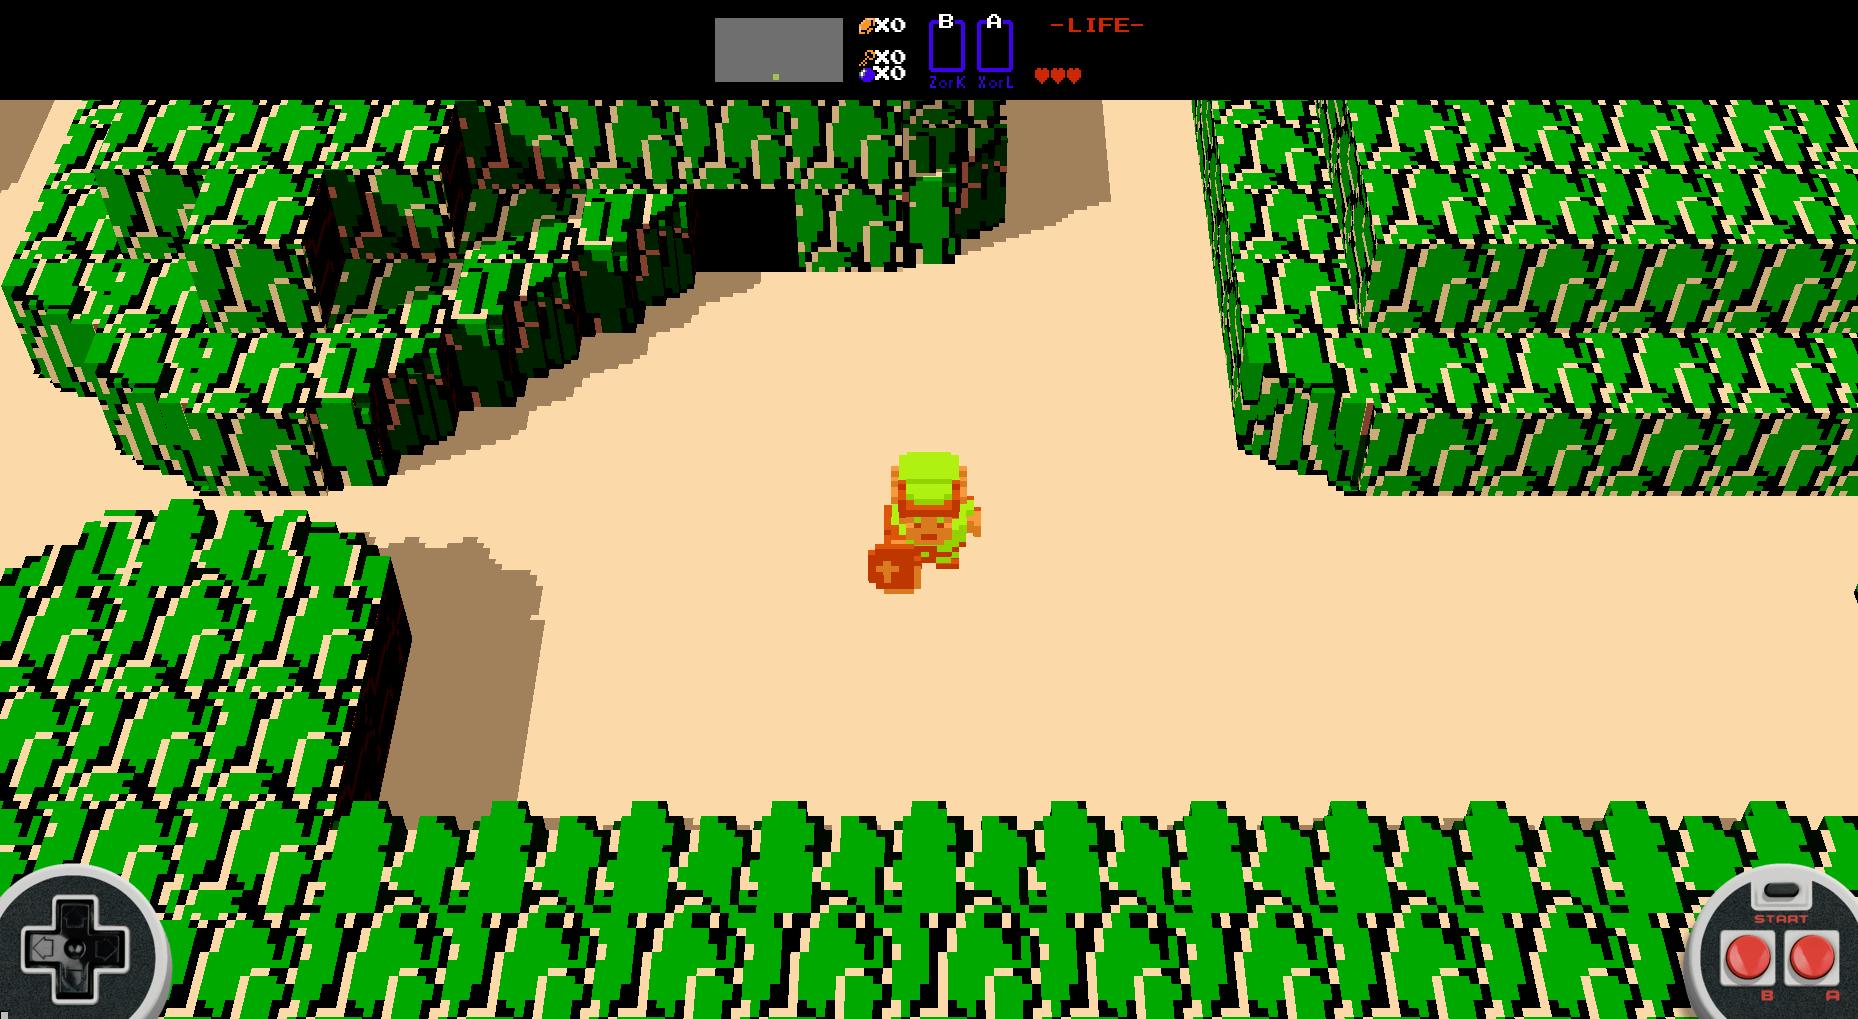 Legend of Zelda in WebGL Voxels